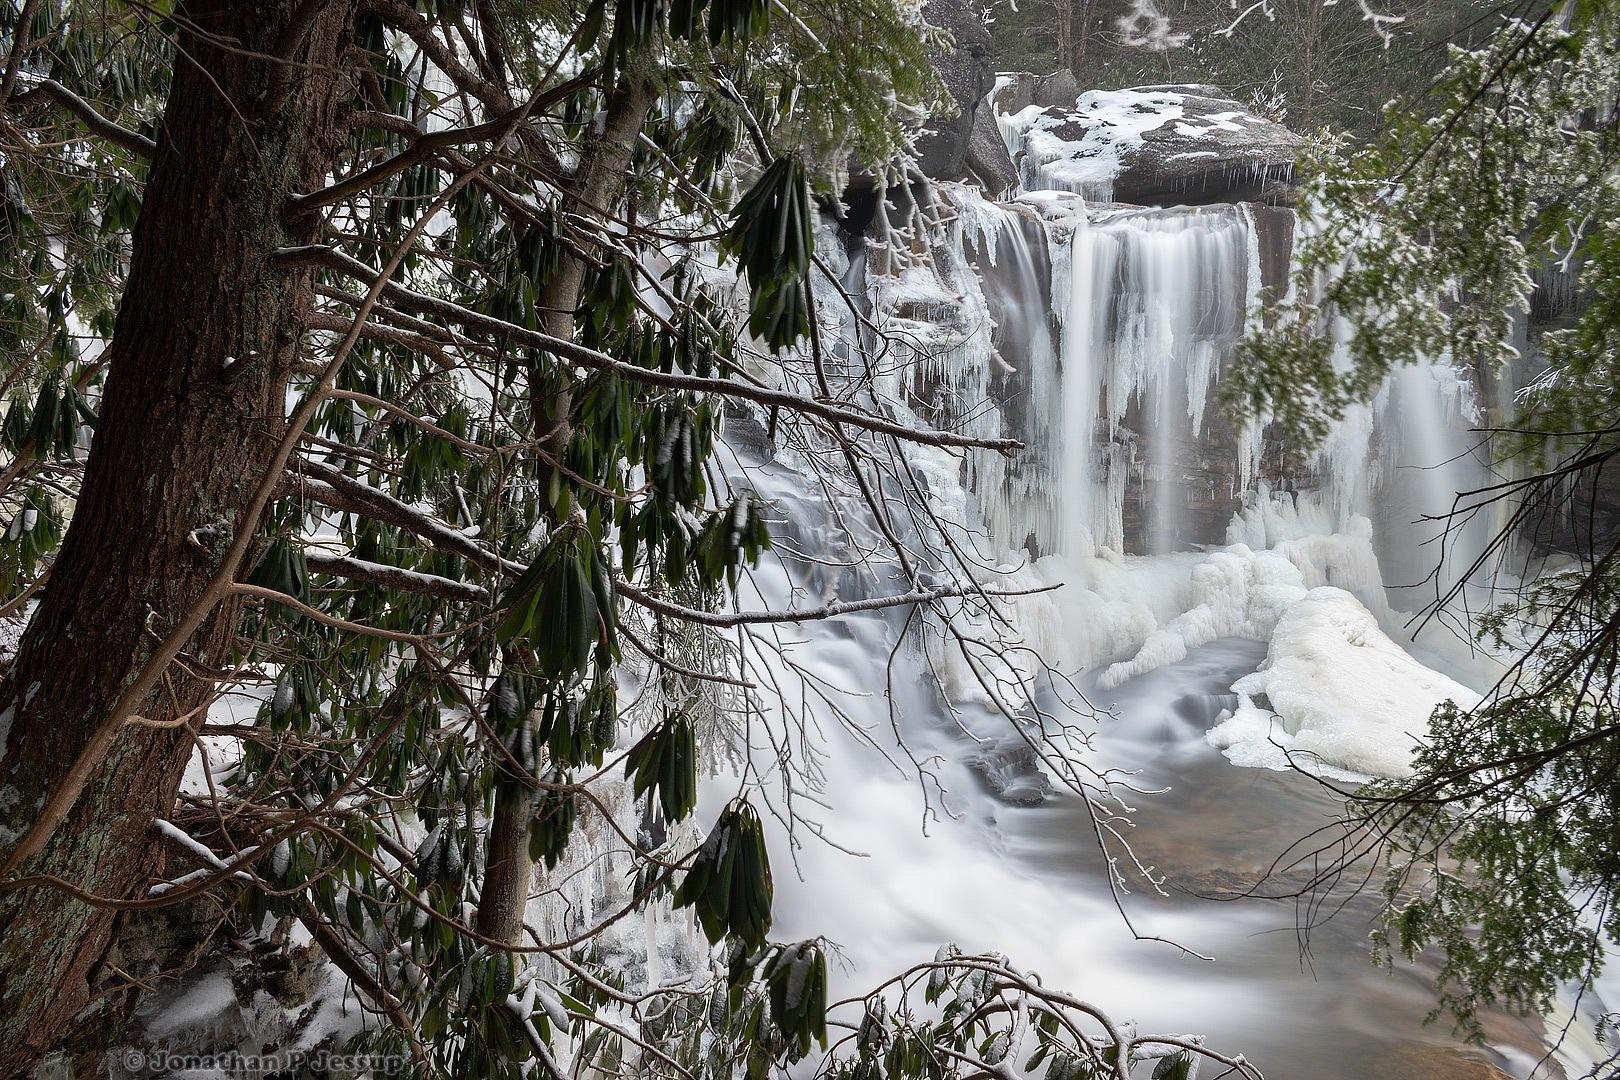 Roaring Waterfalls by Jonathan P Jessup